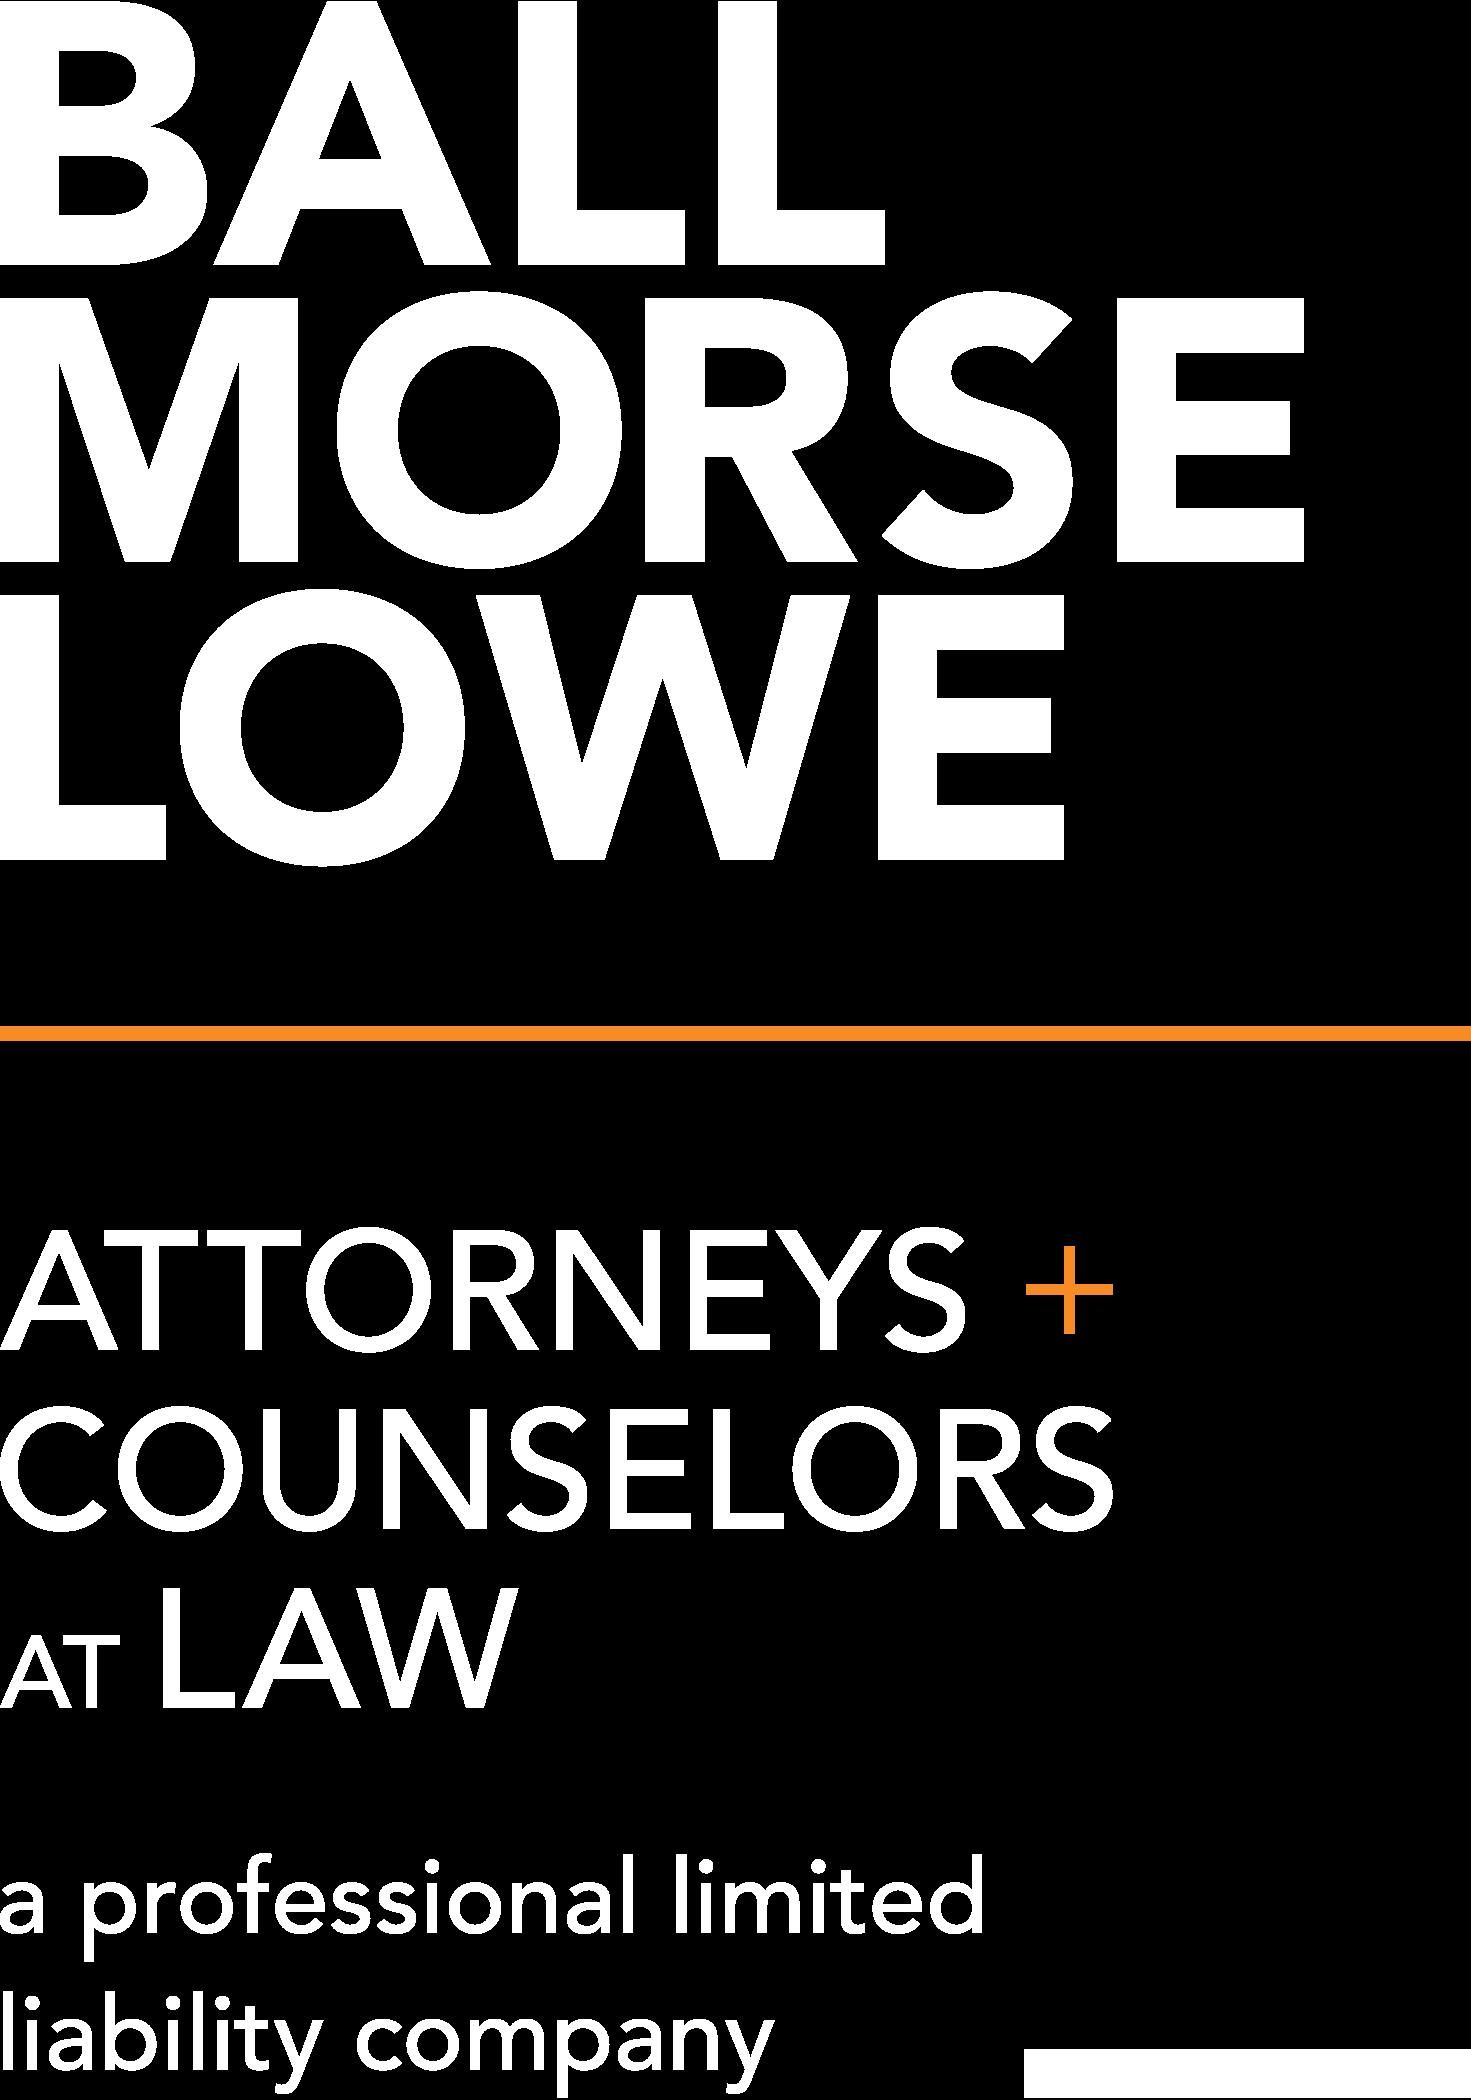 Ball Morse Lowe Logo